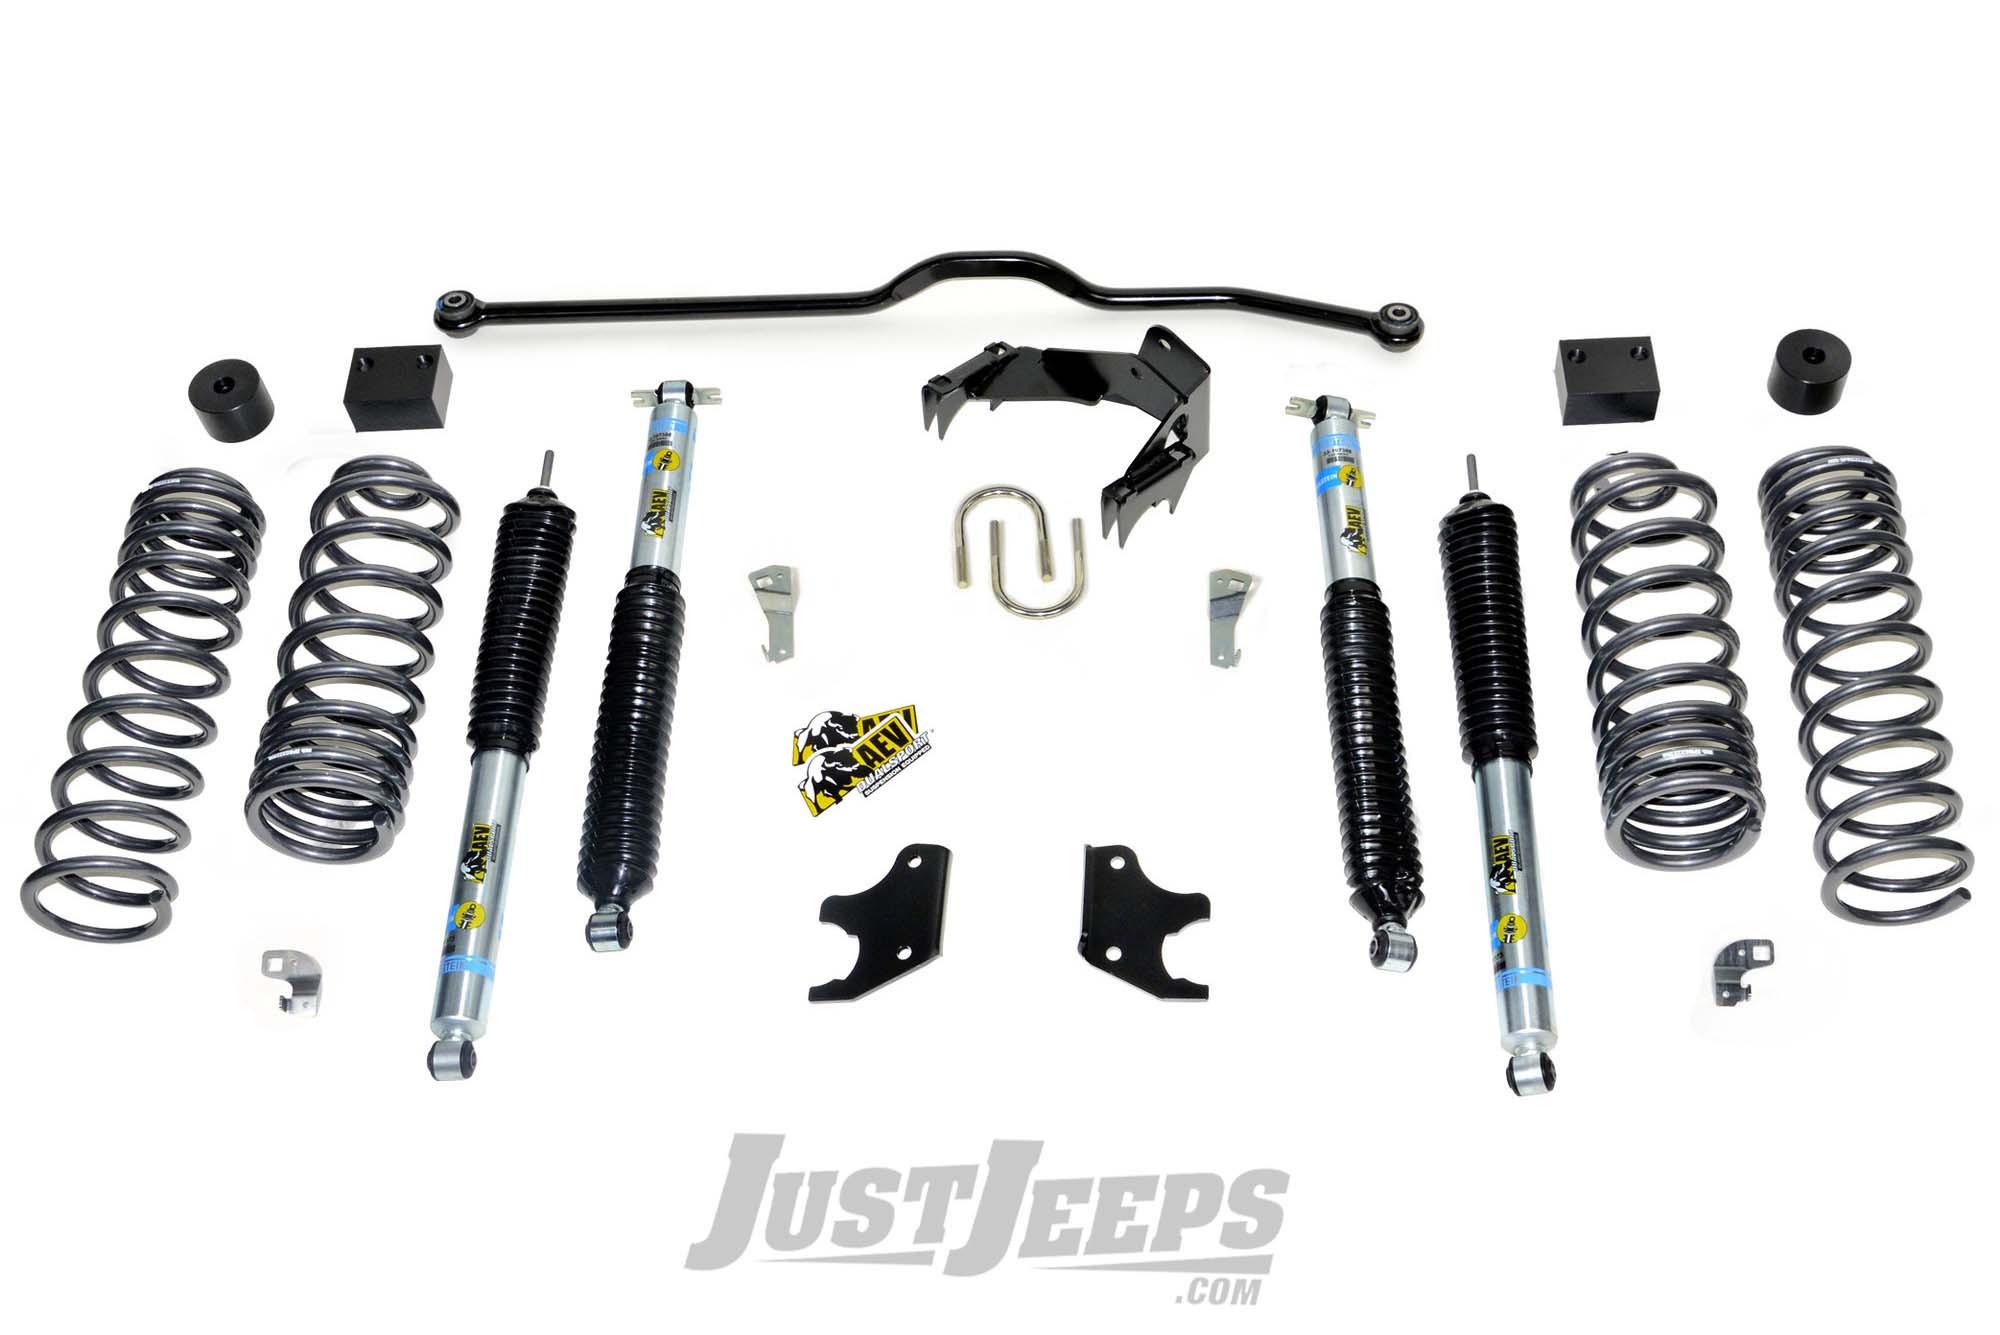 "AEV 2.5"" DualSport XT Suspension System With Bilstein Shocks For 2007-18 Jeep Wrangler JK 2 Door Models"